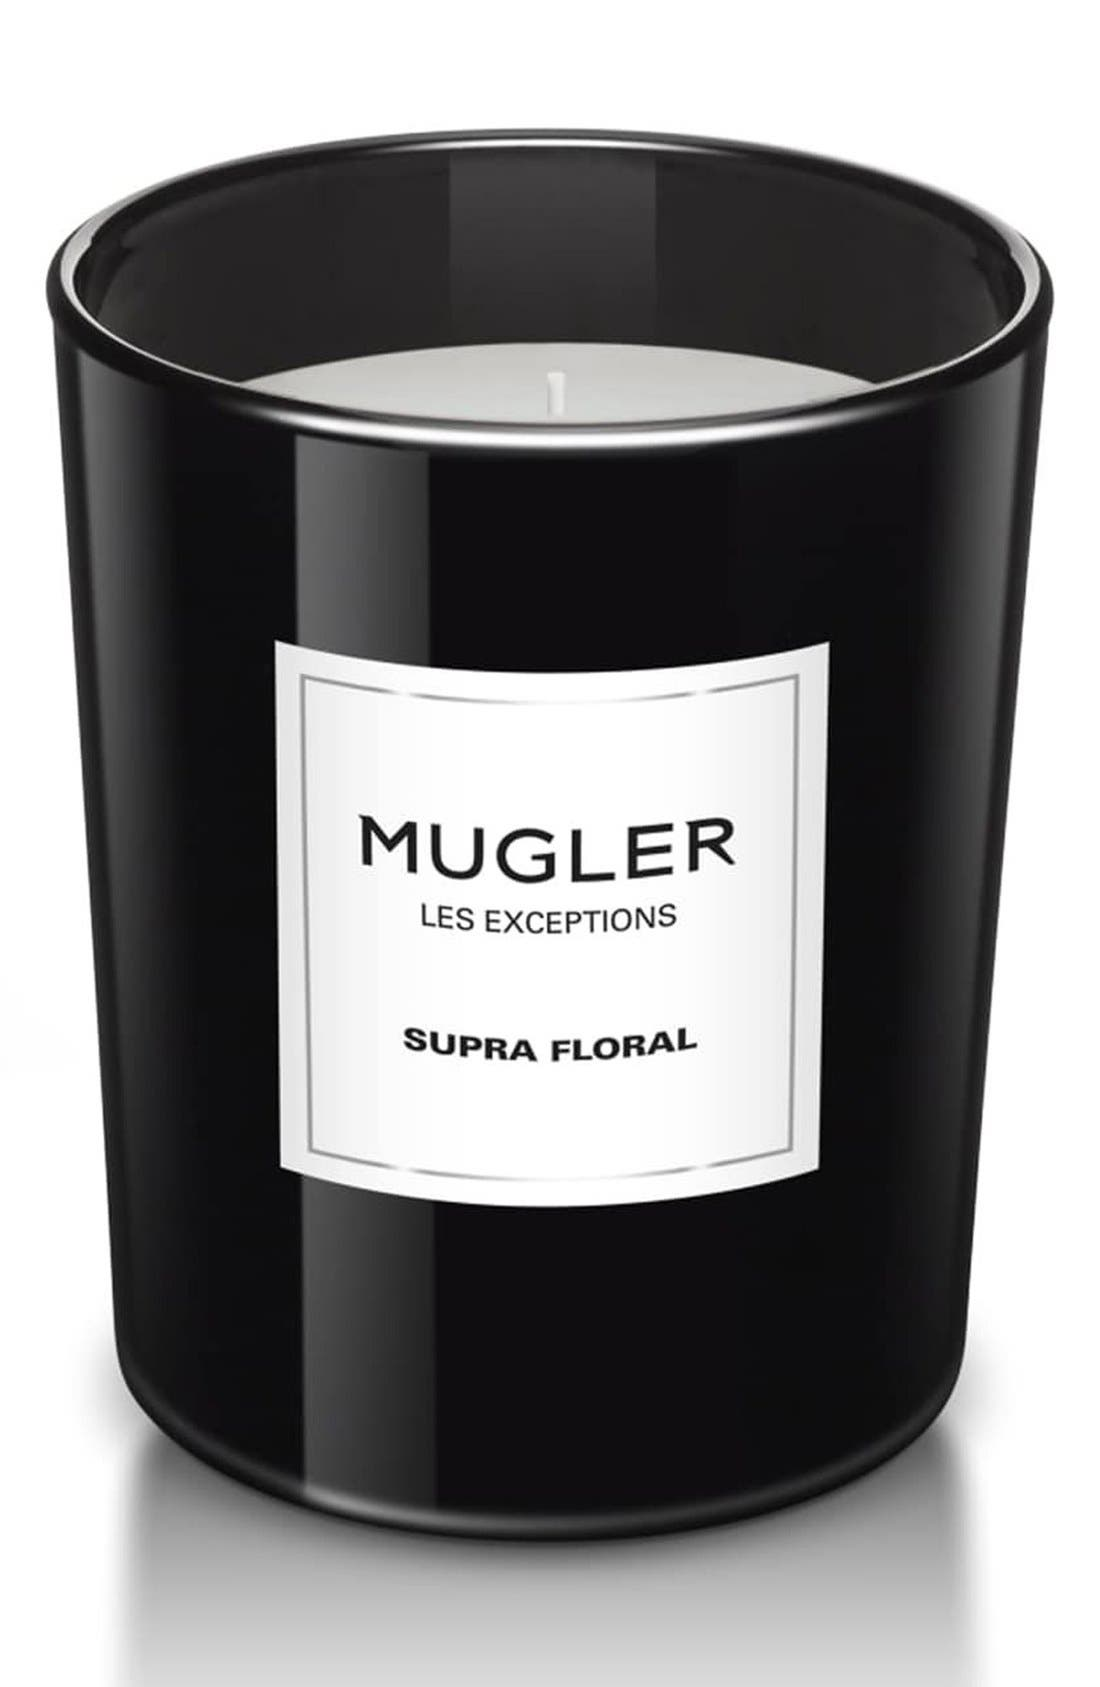 MUGLER,                             'Les Exceptions - Supra Floral' Candle,                             Main thumbnail 1, color,                             NO COLOR